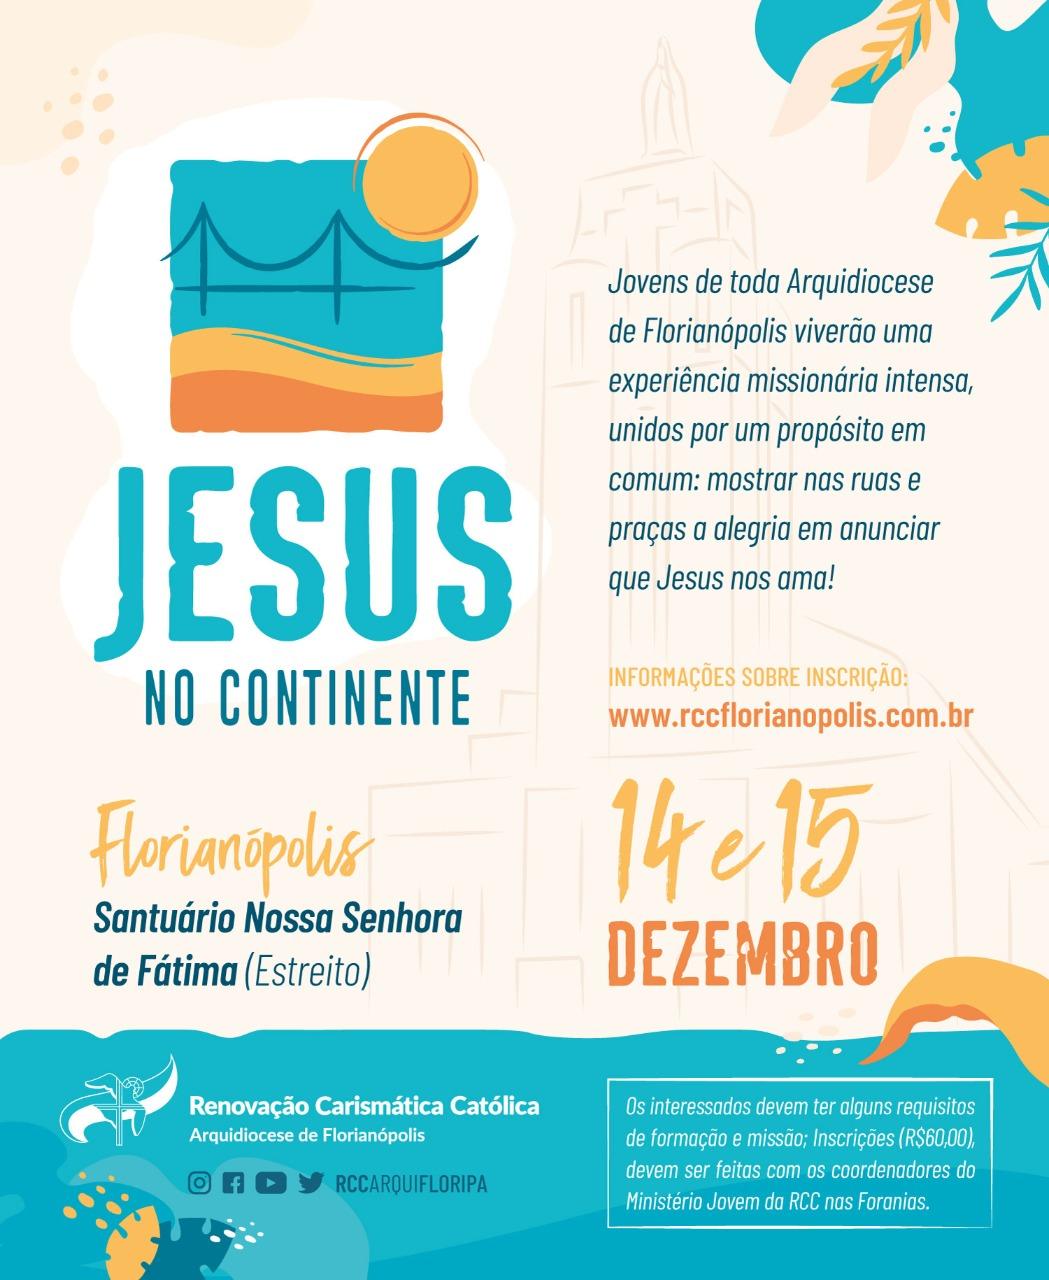 RCC Arquidiocese de Florianópolis promove a missão Jesus no Continente